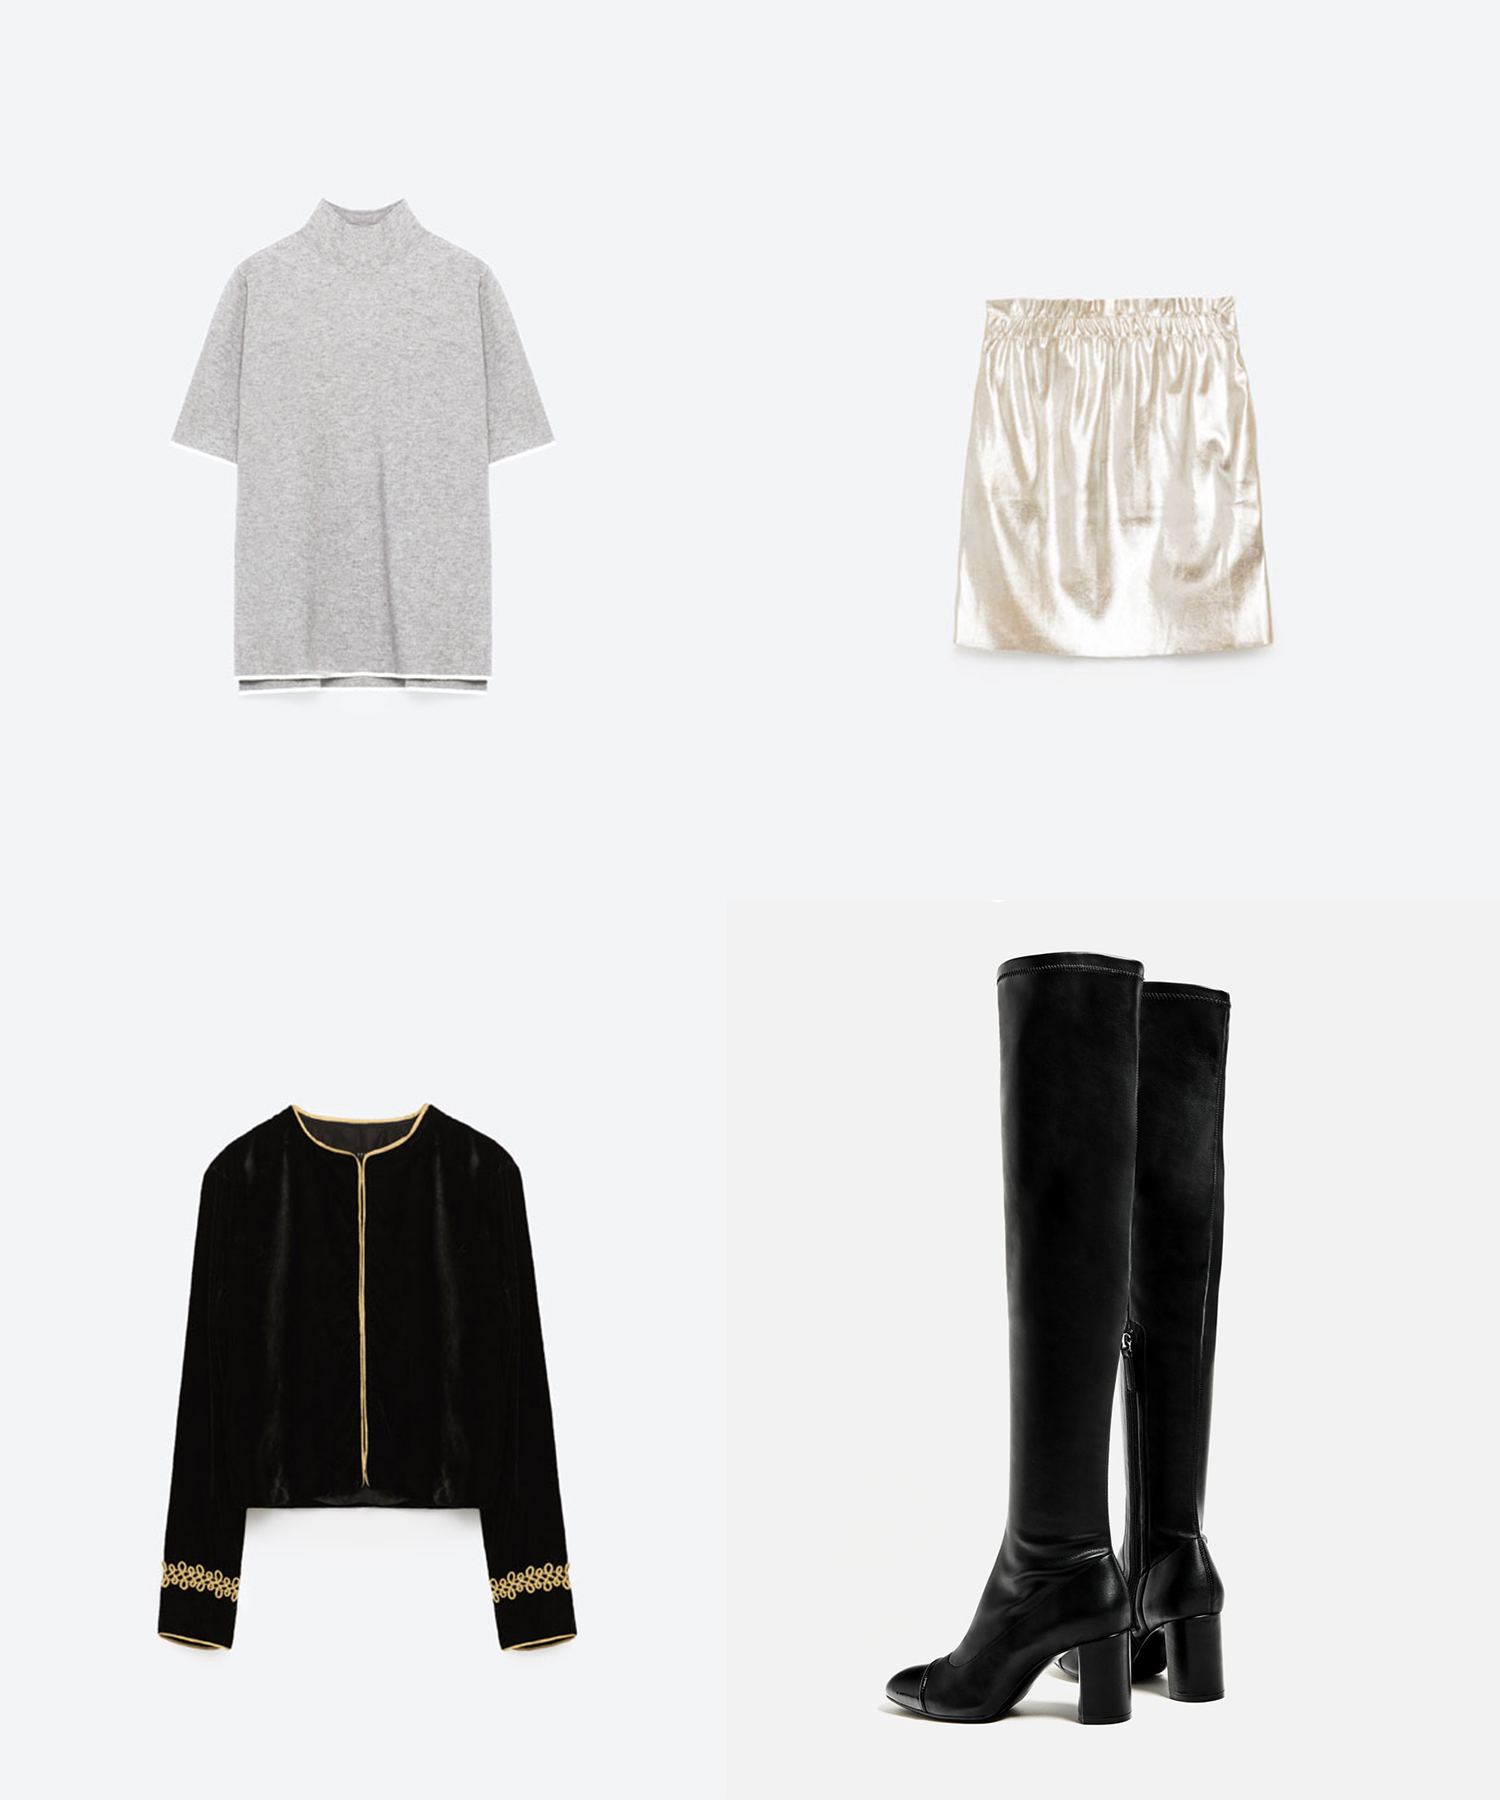 Turtleneck Sweater   ($40) //   Faux Leather Mini Skirt in Silver   ($30) //   Velvet Blazer + Gold Applique   ($70) //   OTK High Heel Cap Toe Boots   ($90)